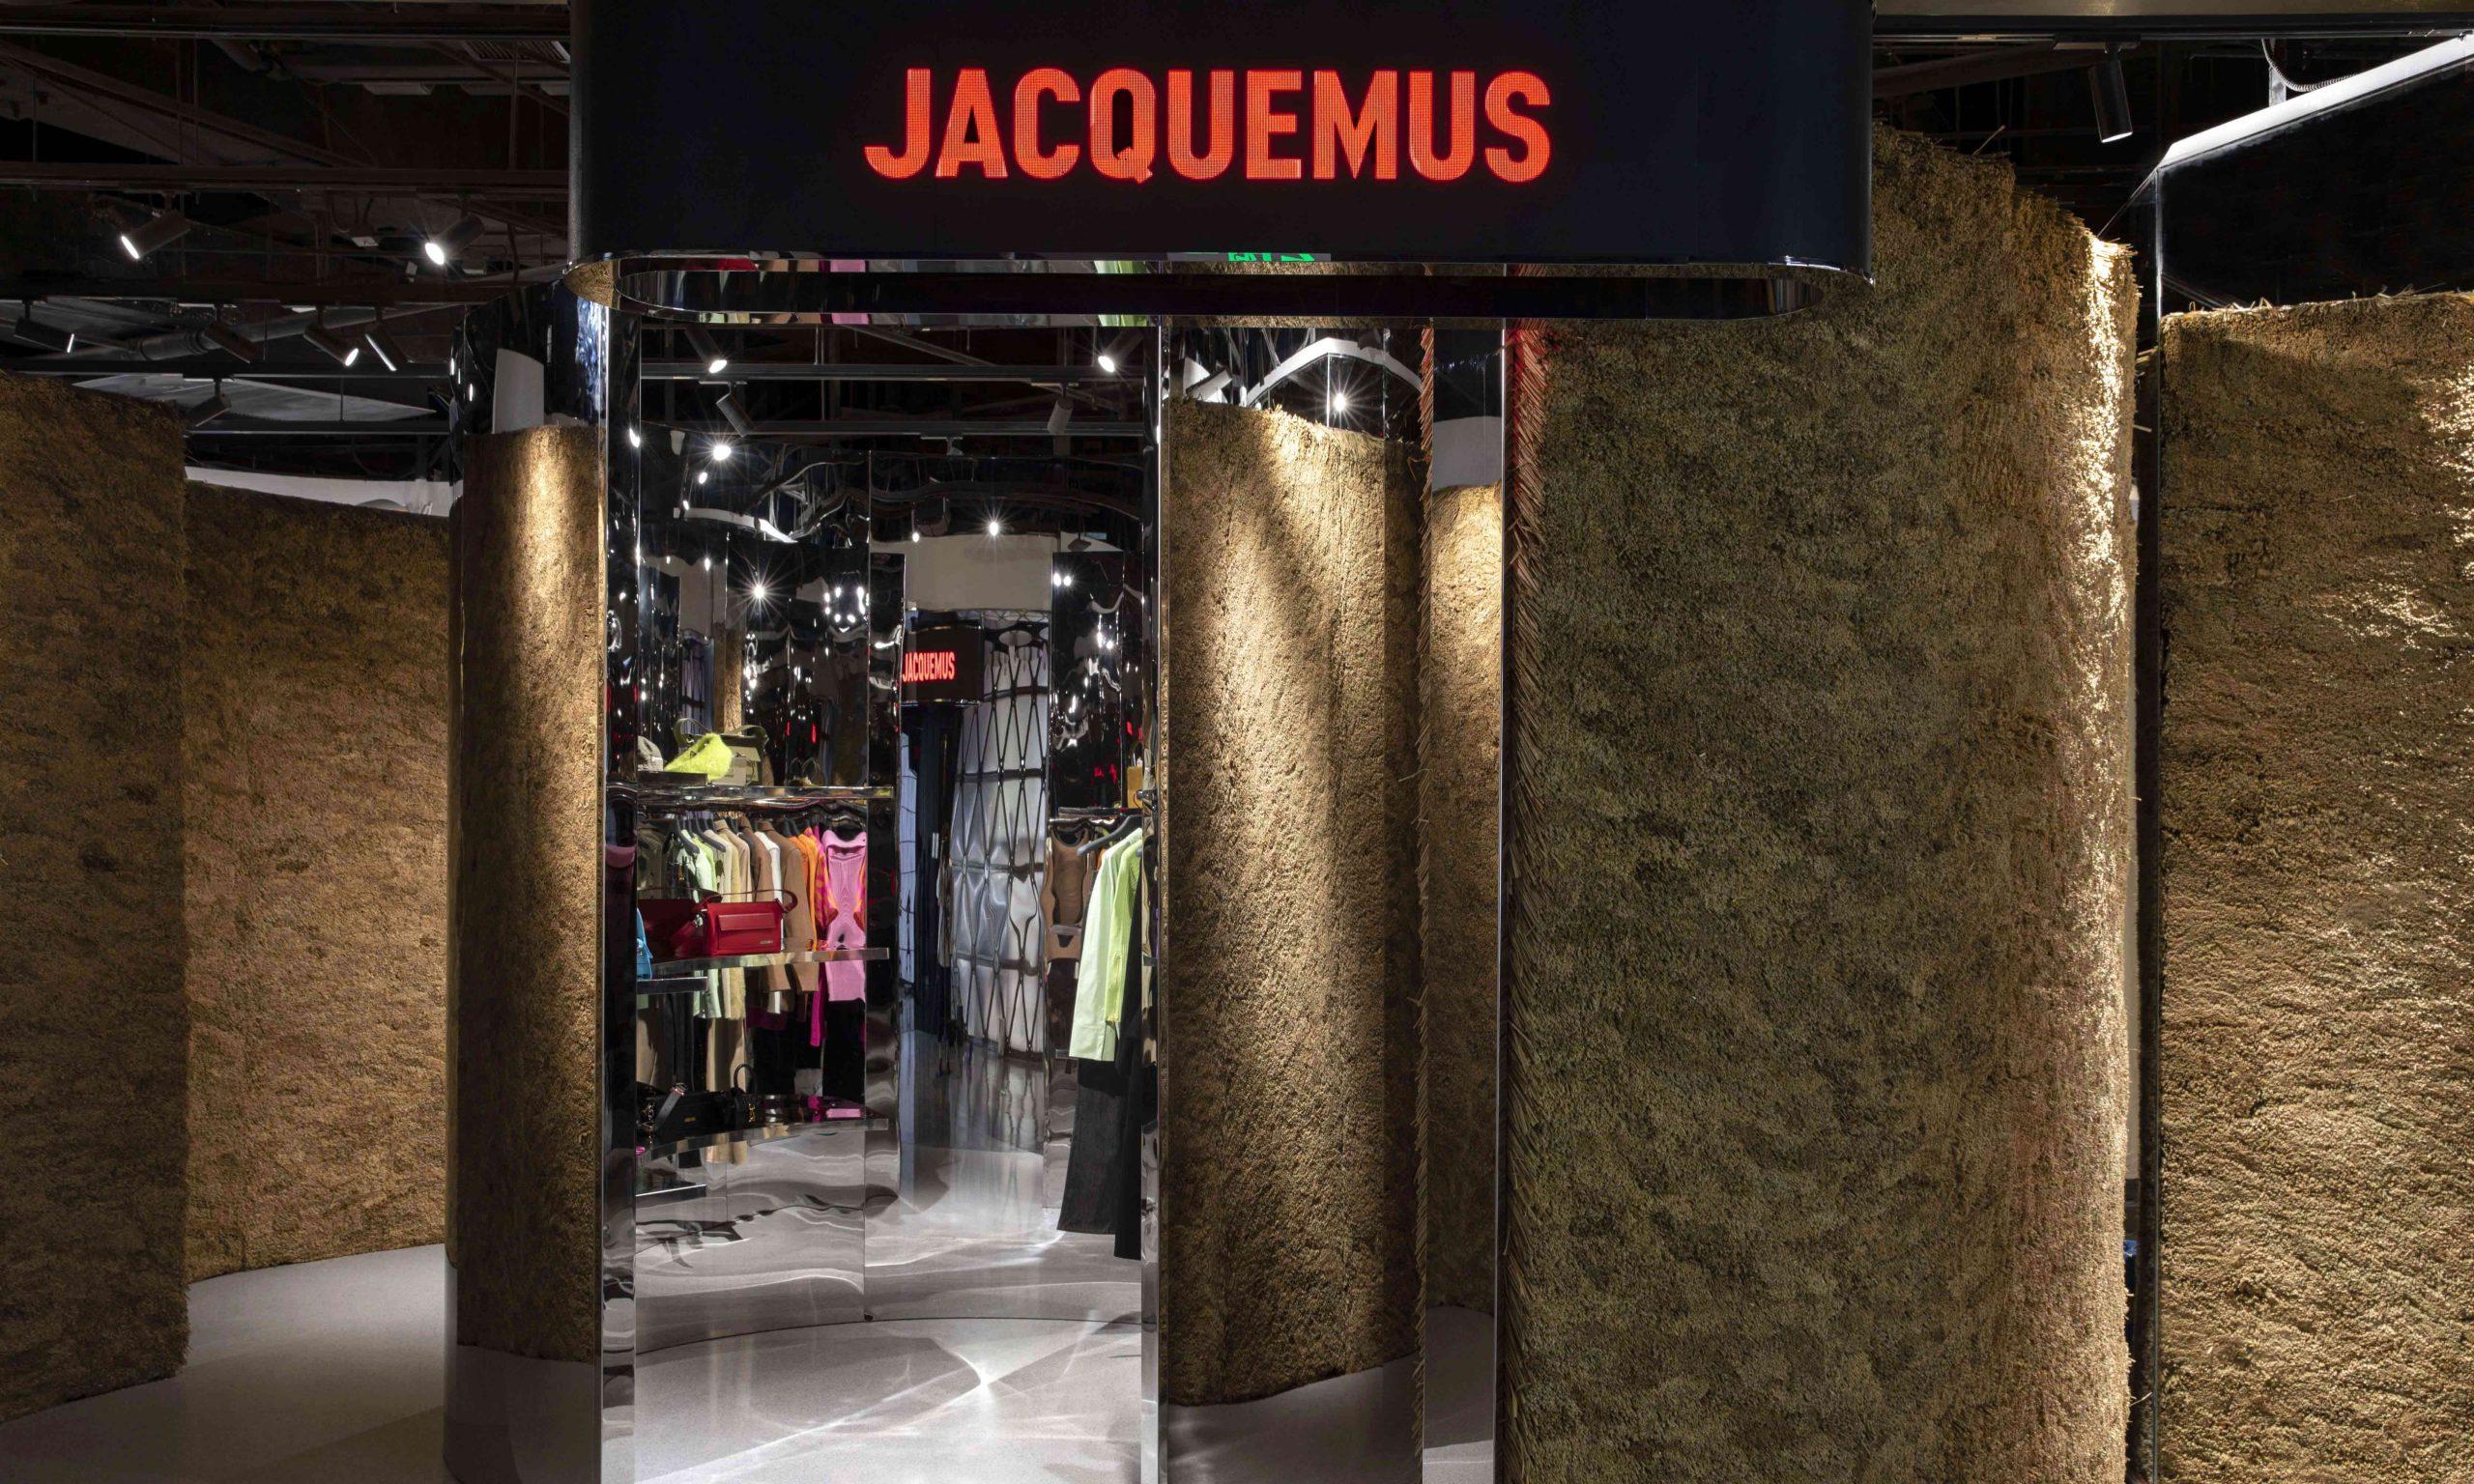 踱步山间,JACQUEMUS 限时店铺已登陆 SKP-S station S